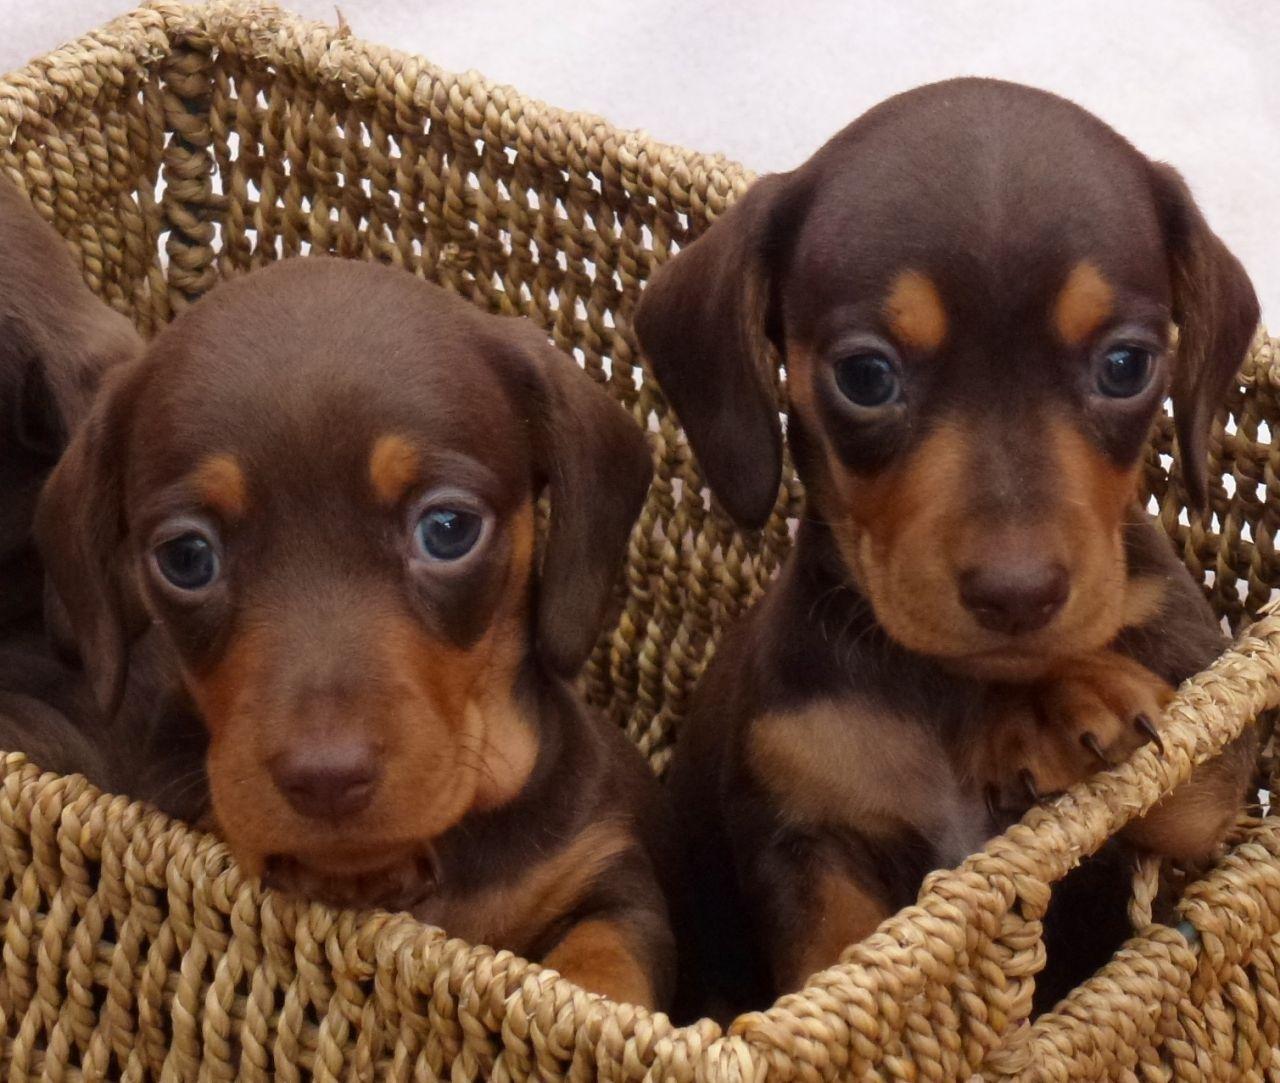 Dachshund Friendly And Curious Dachshund Puppy Miniature Dachshund Puppies Dachshund Breed